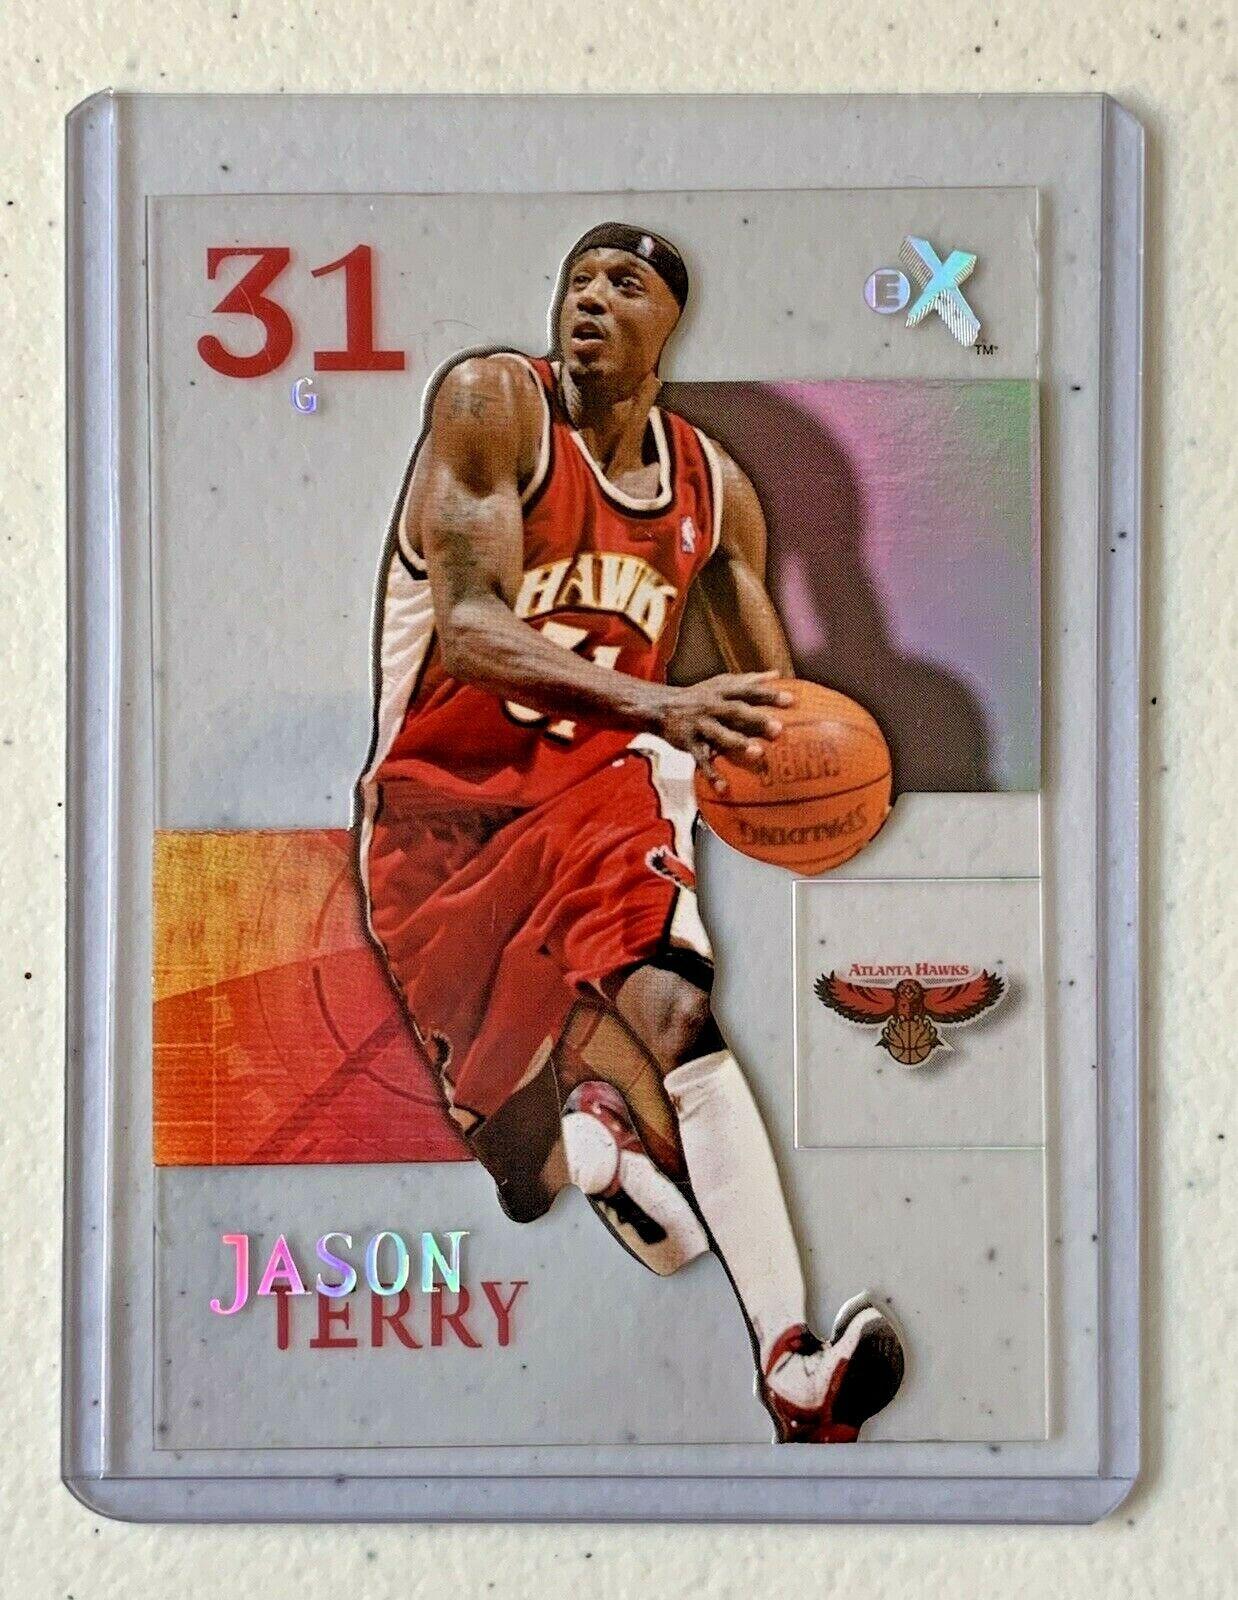 Jason Terry Now/66 #65 Atlanta Hawks Fleer Basketball Card with Hard Case 31G image 10